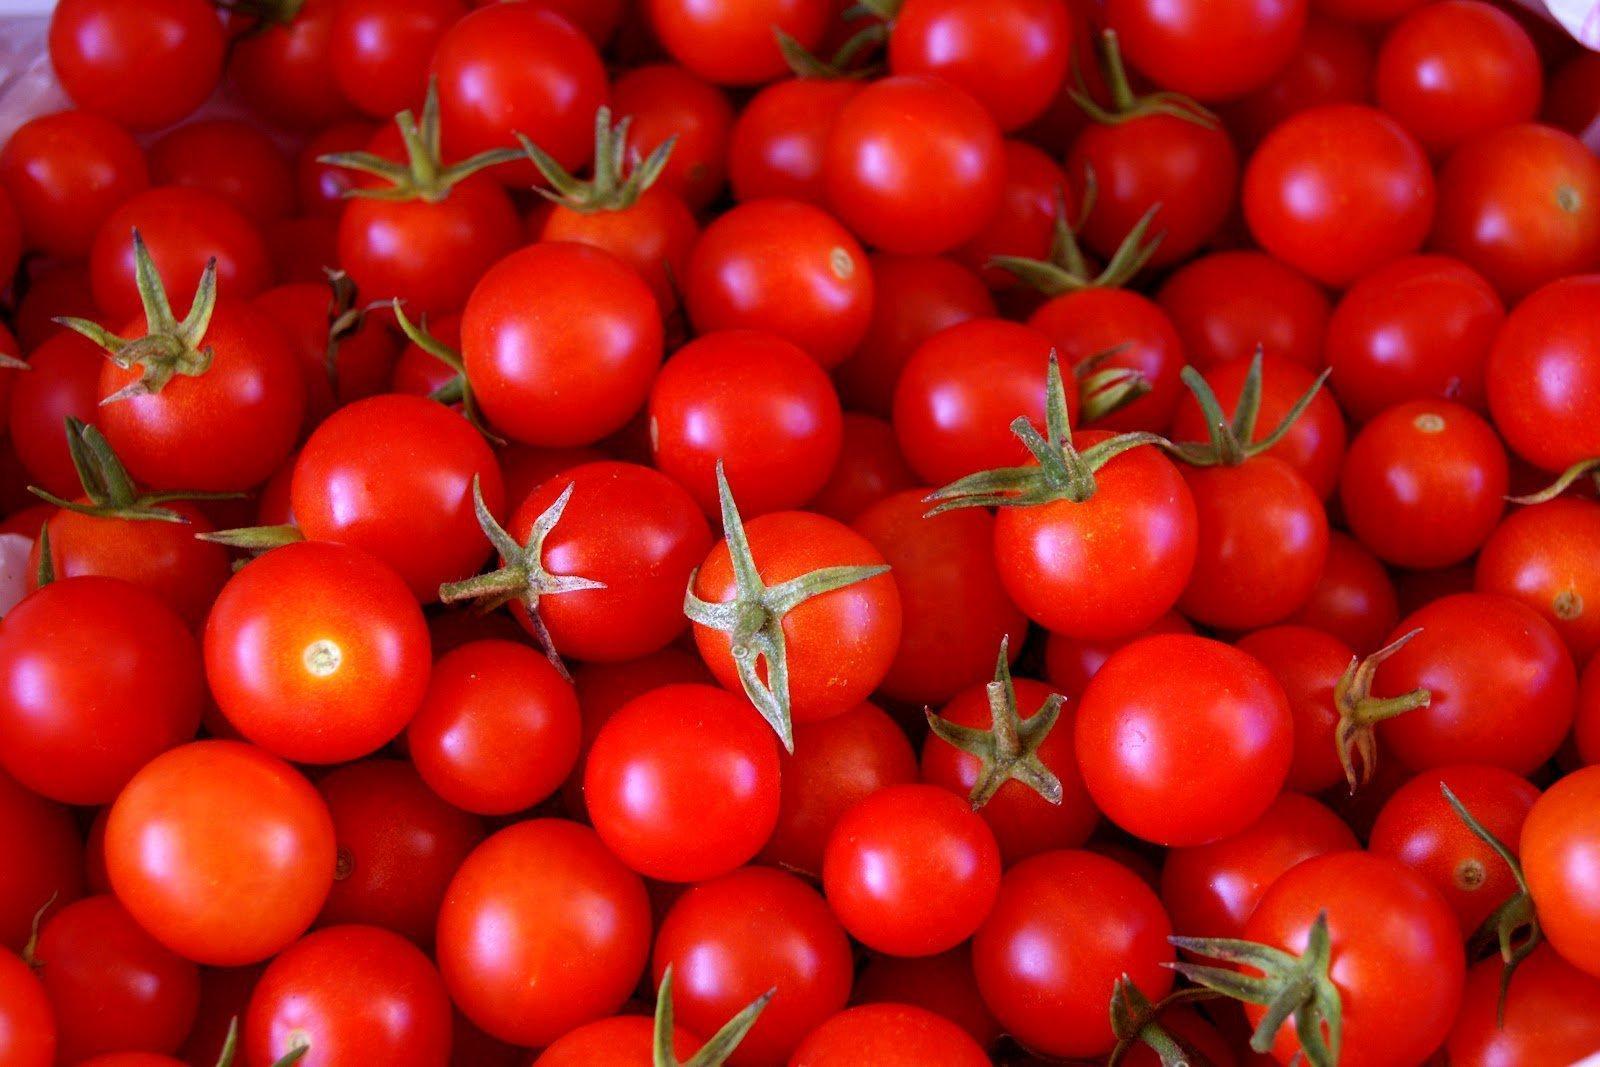 Tomates: Utilidades, Receitas e Benefícios